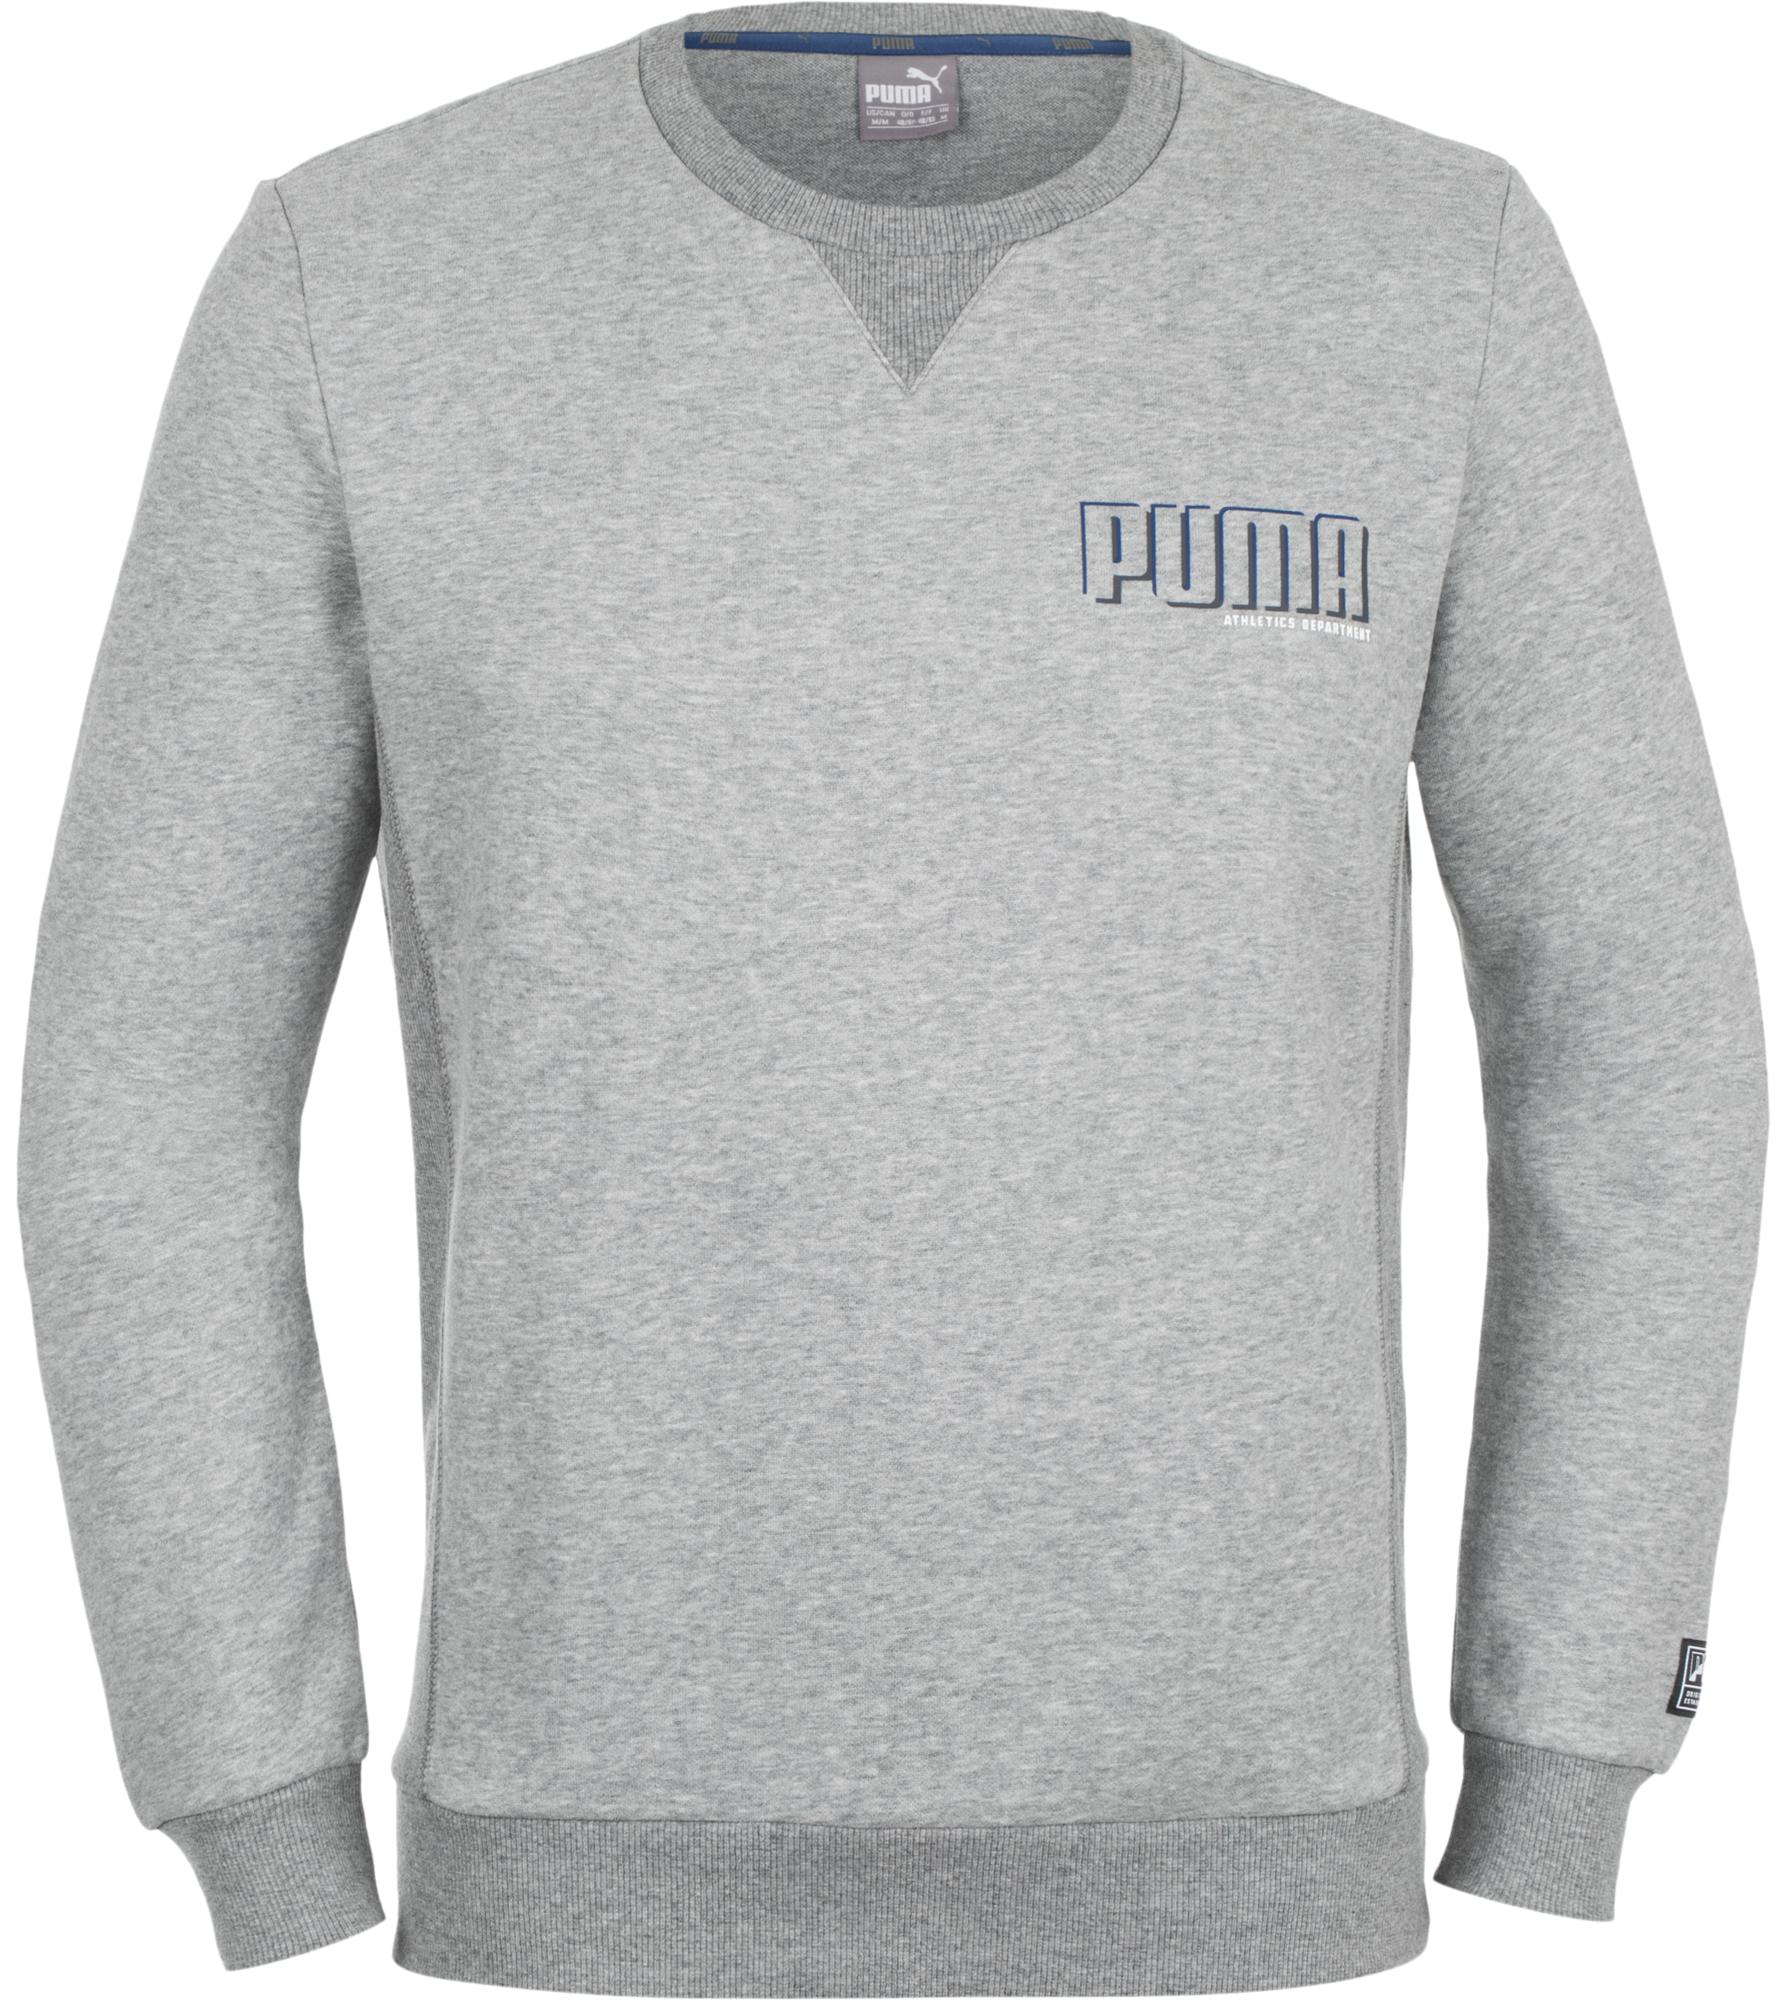 Puma Джемпер мужской Puma Style Athletics джемпер мужской шерсть